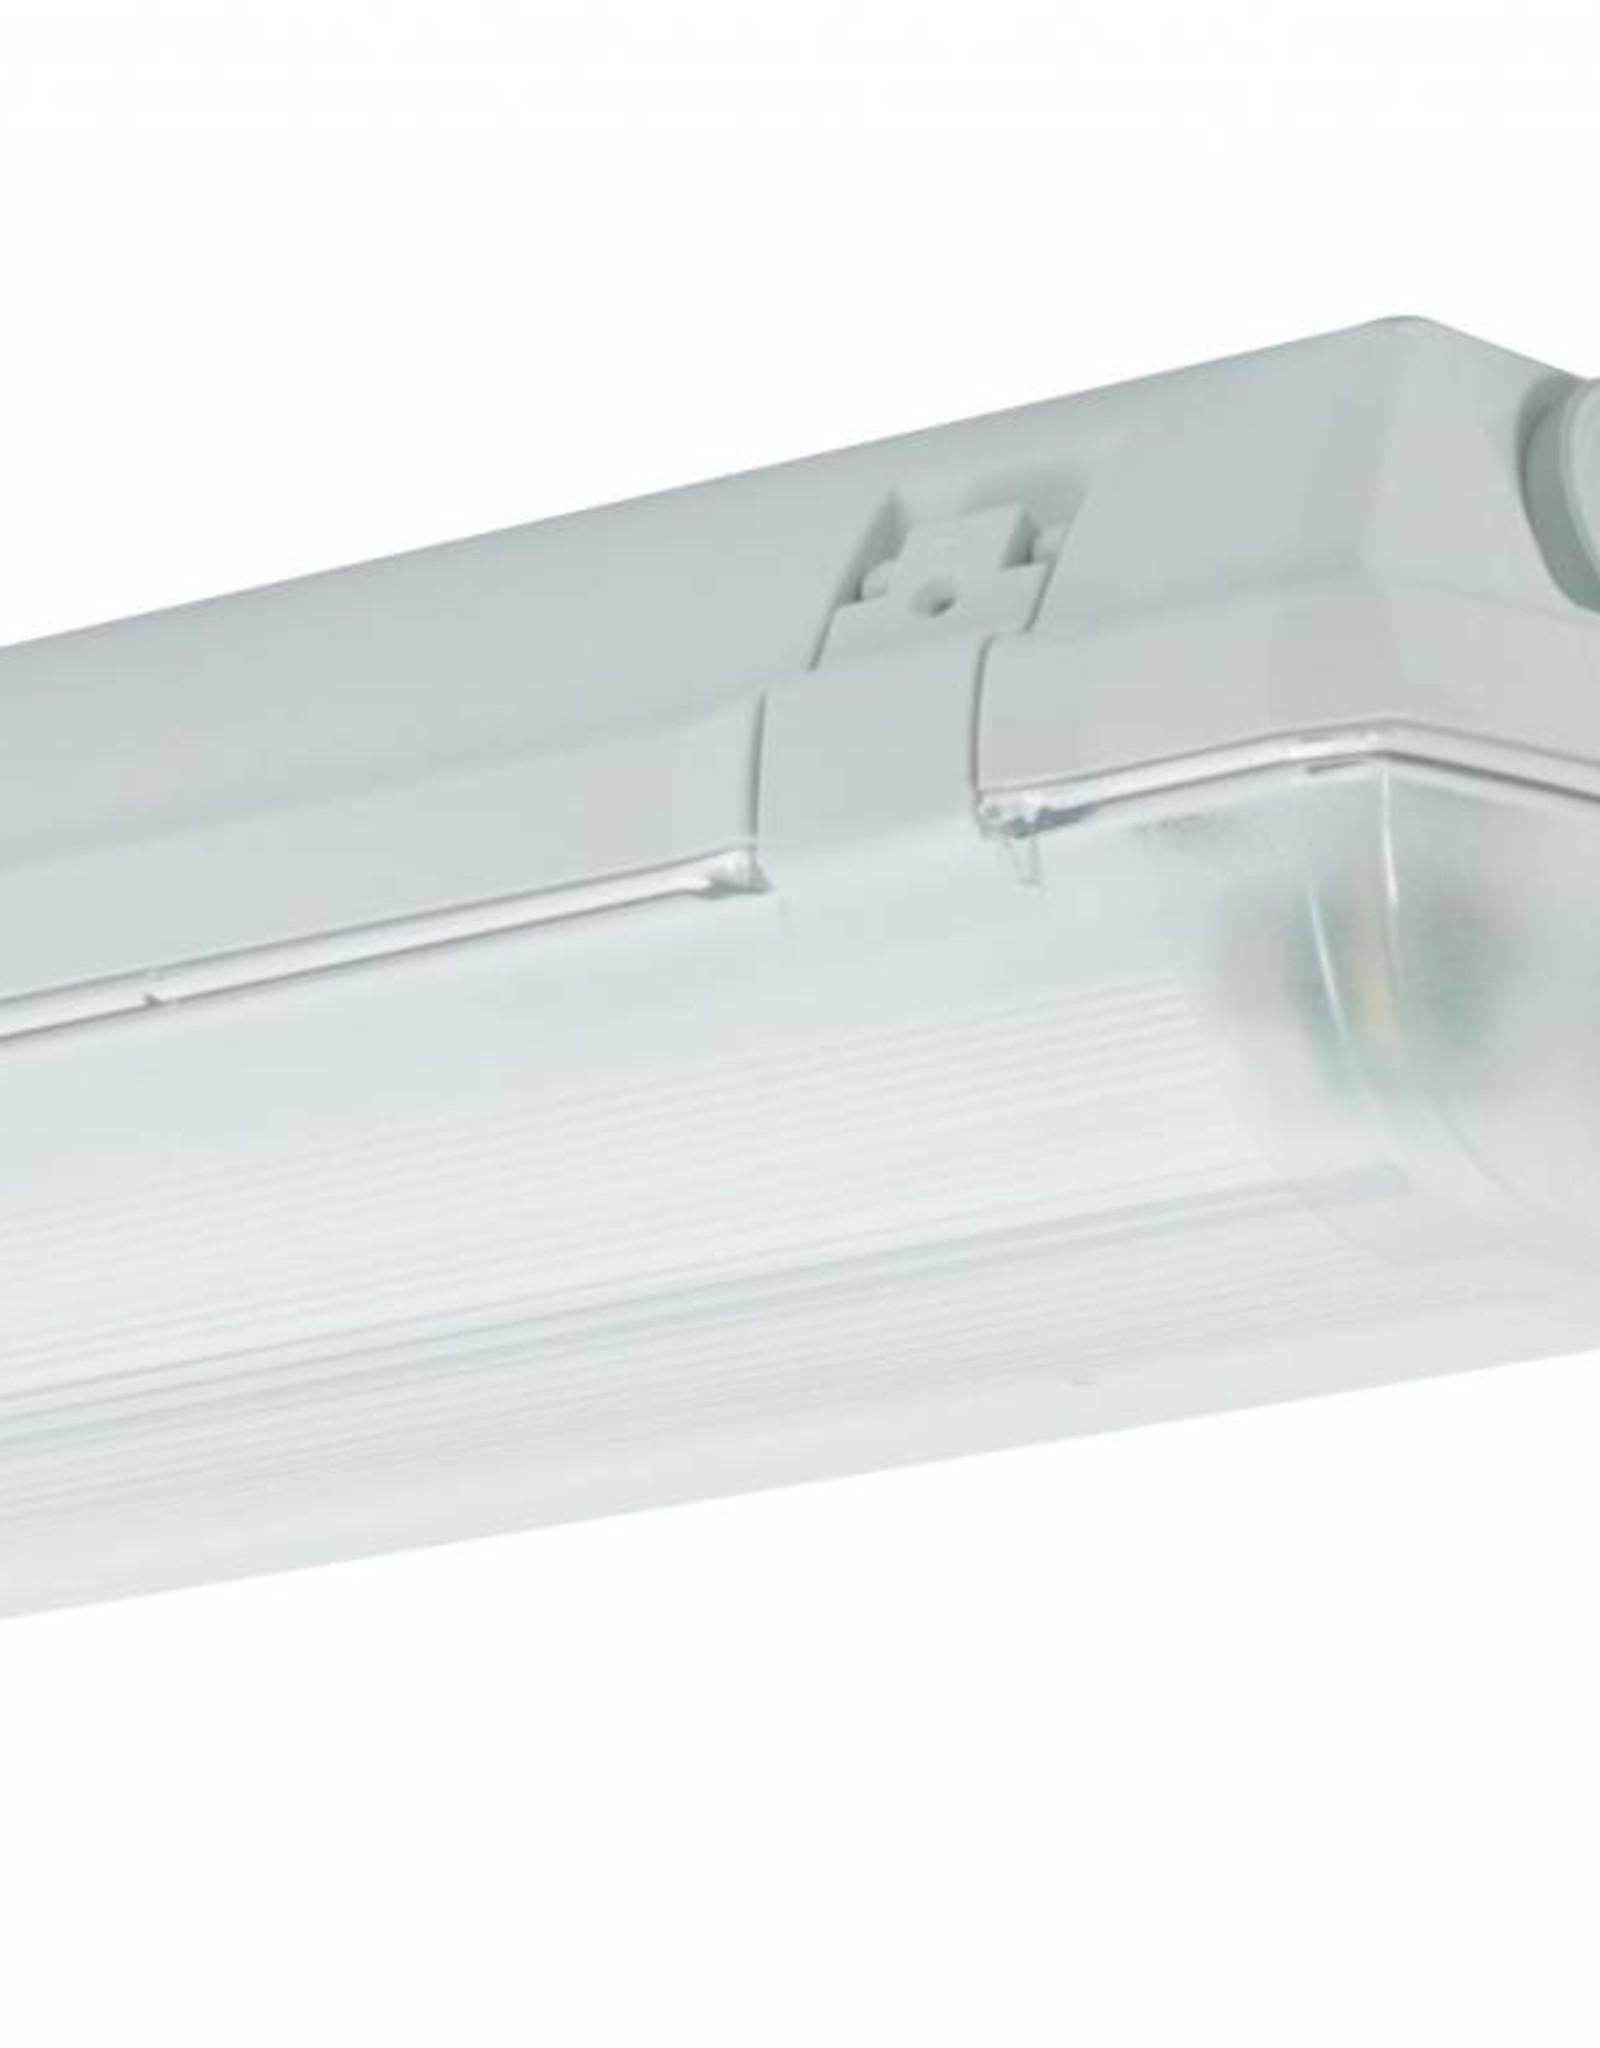 Prima 2x14W HE - ABS - inox clips - HF ballast